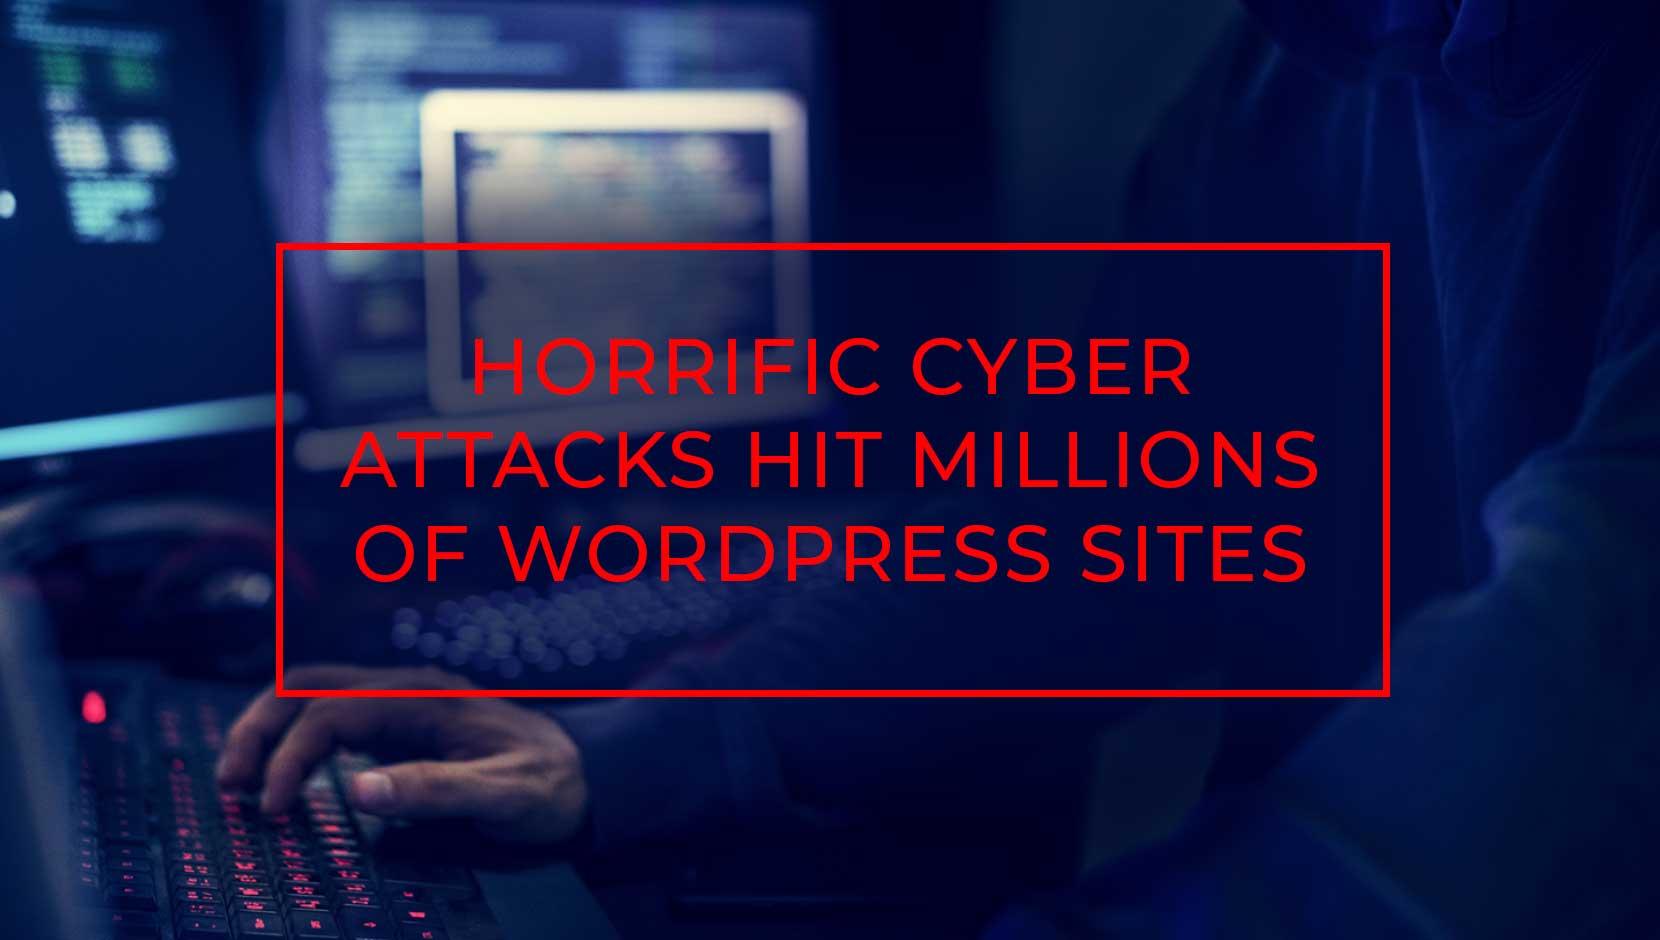 Horrific Cyber Attacks Hit Millions of WordPress Sites